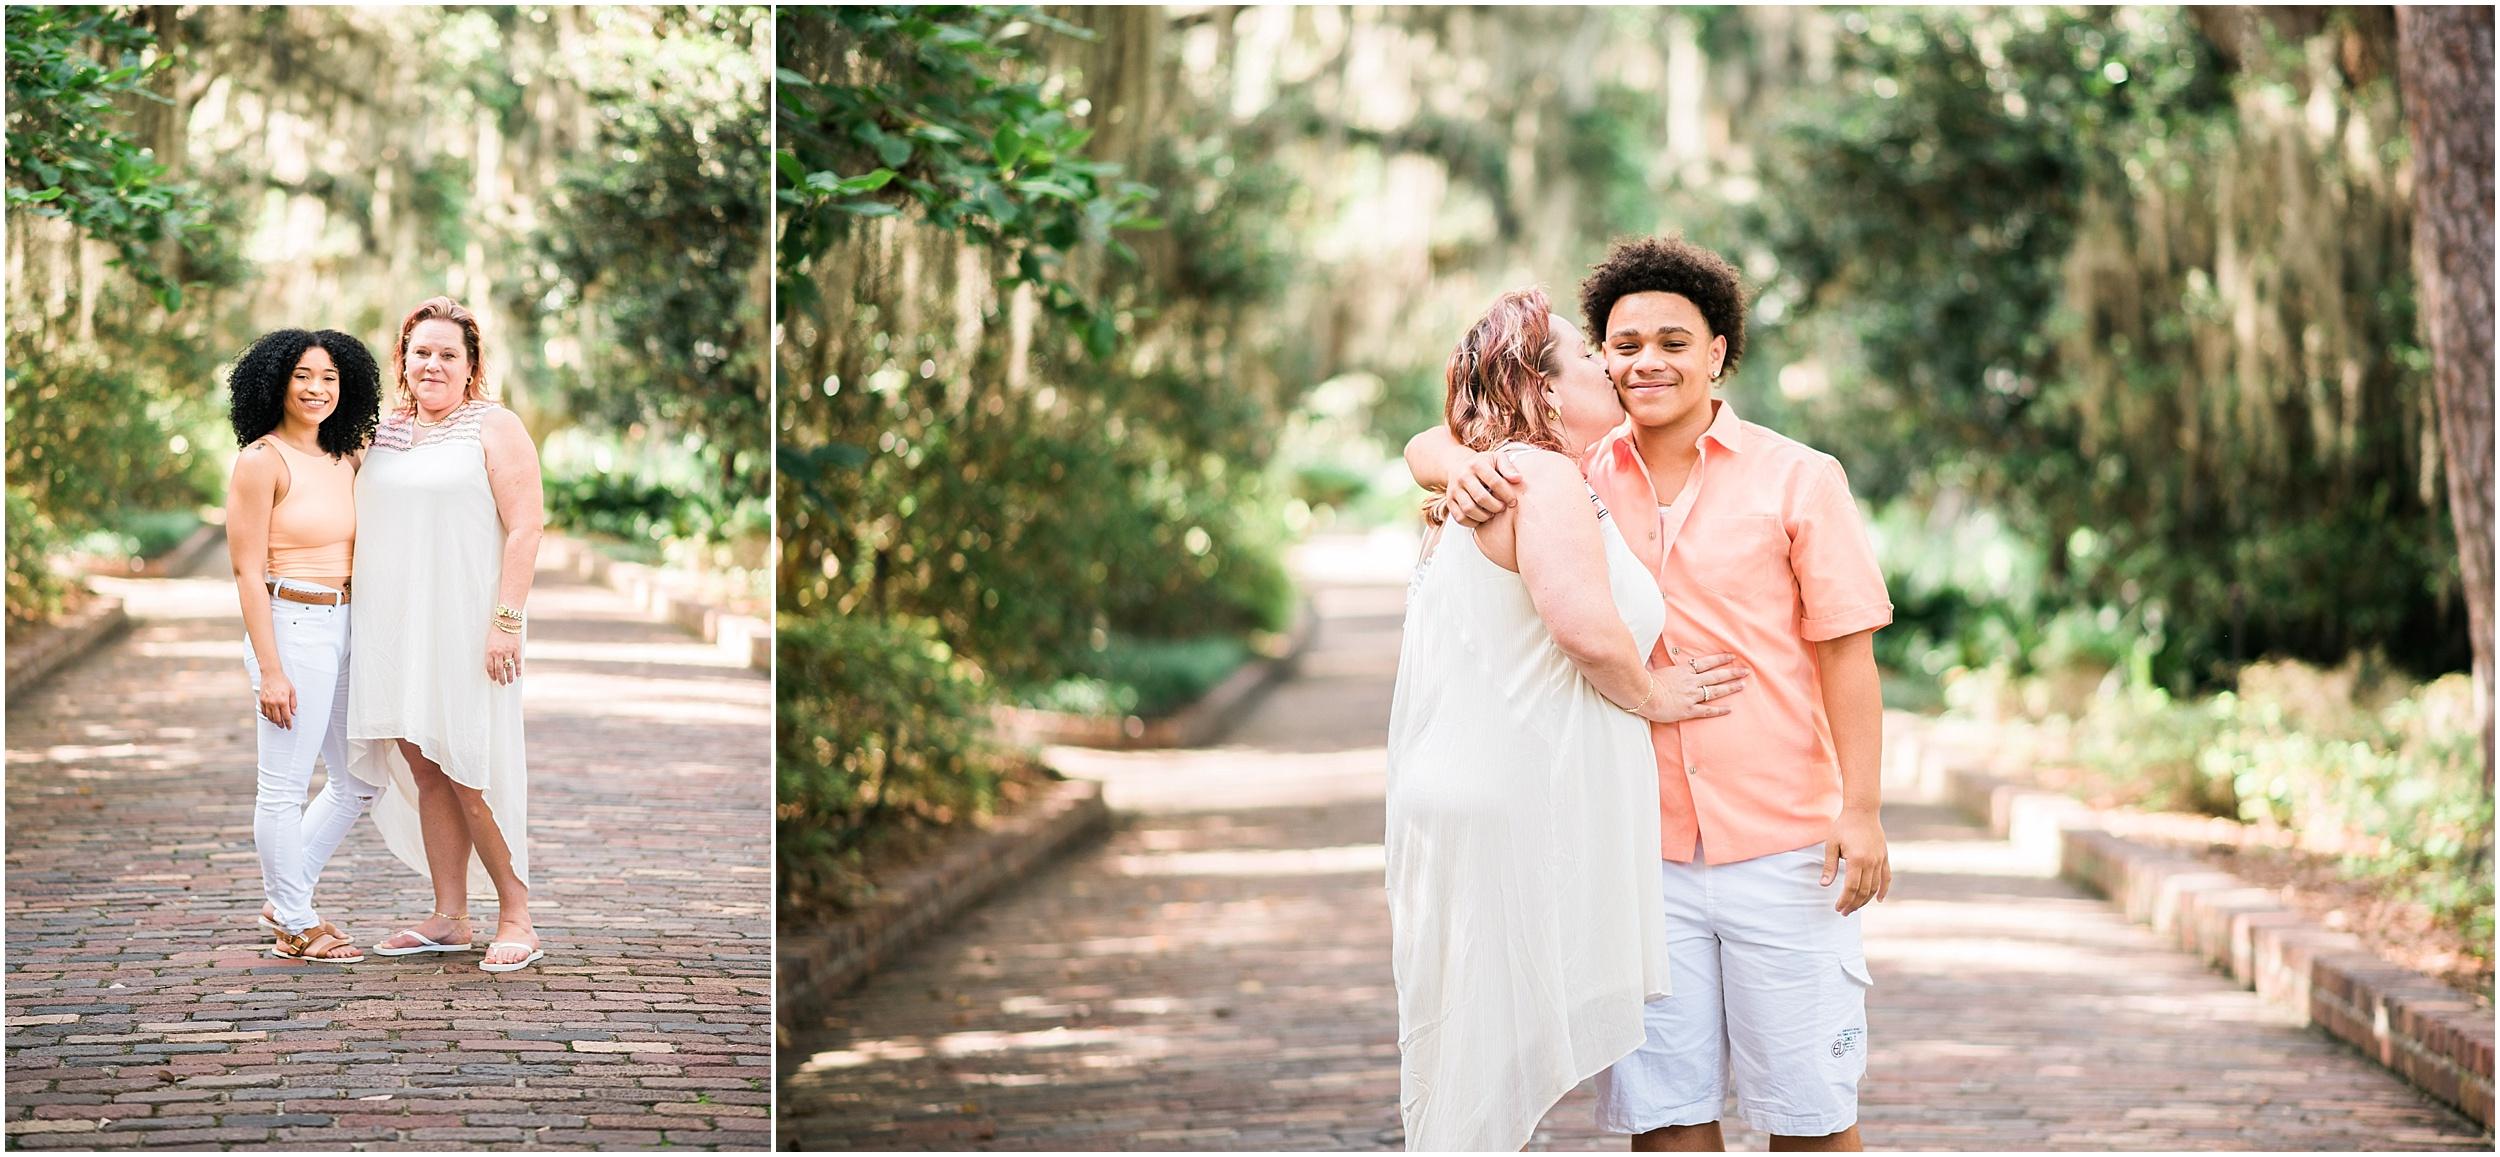 Bolden Family Session, Maclay Gardens Tallahassee Florida_0009.jpg